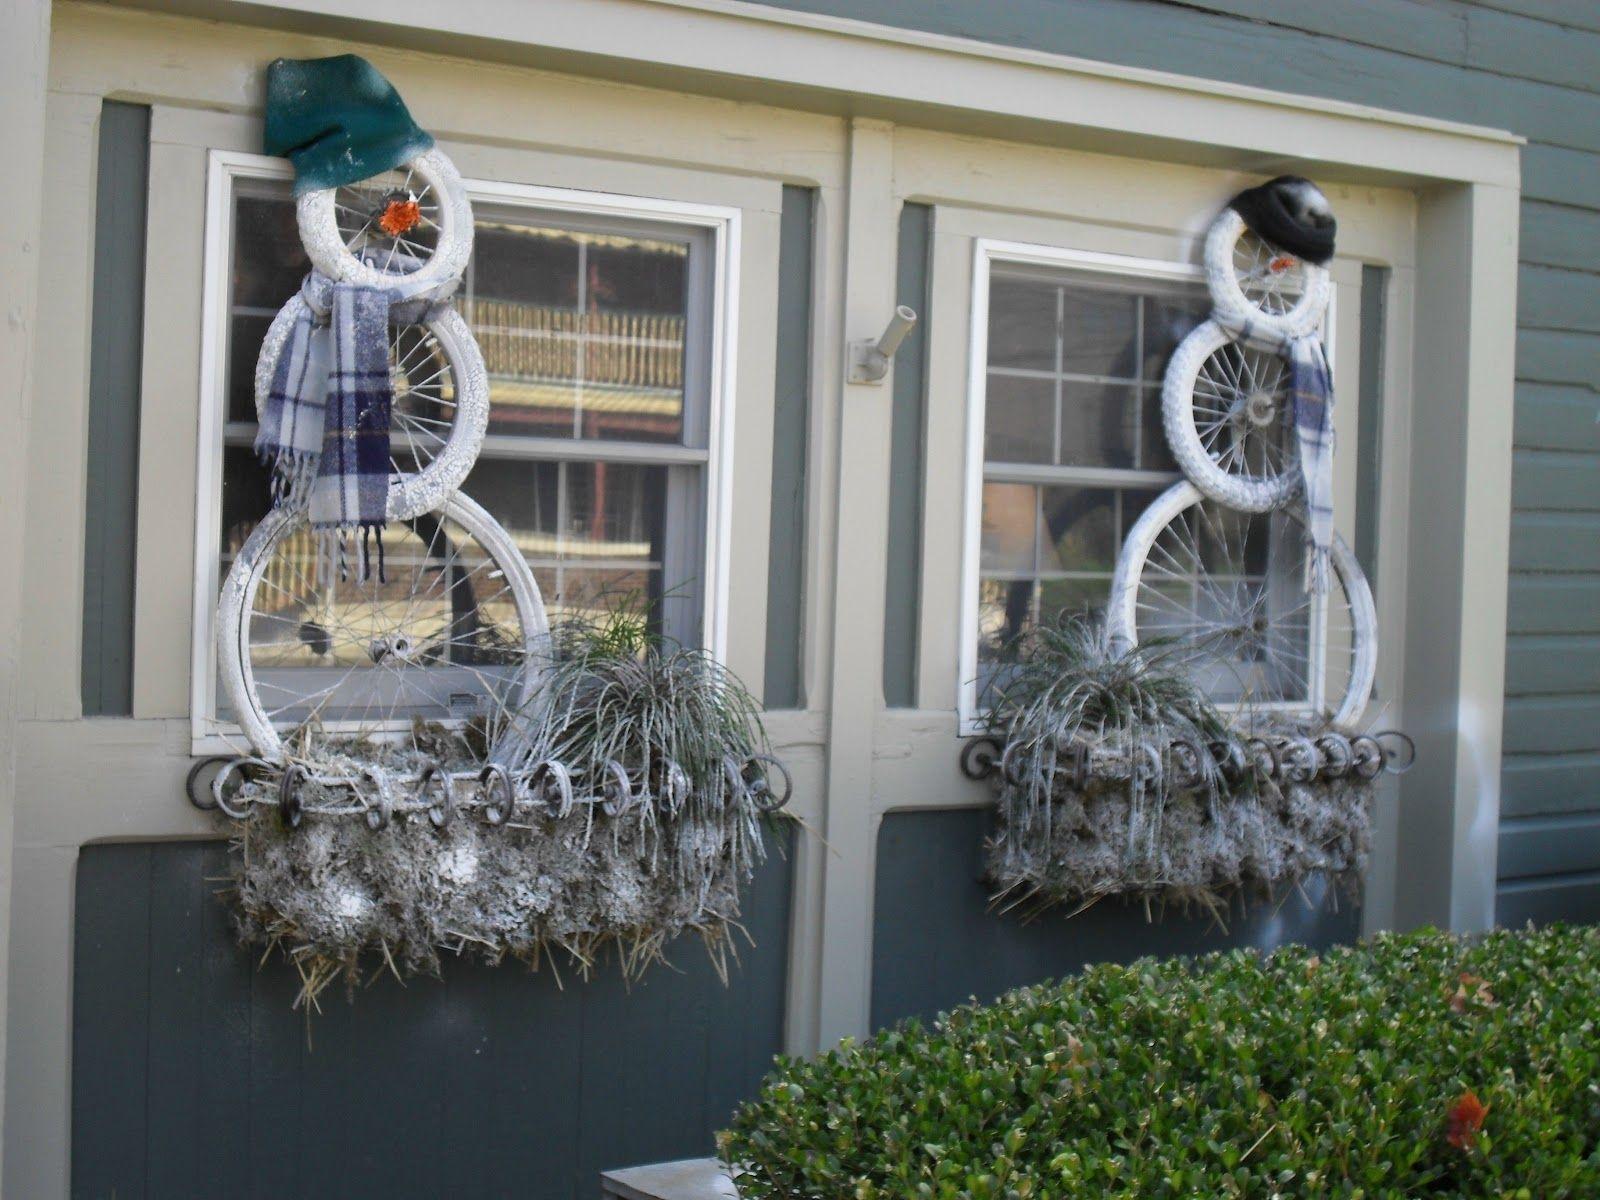 Pin By Amanda Wilson On Christmas Time Snowman Xmas